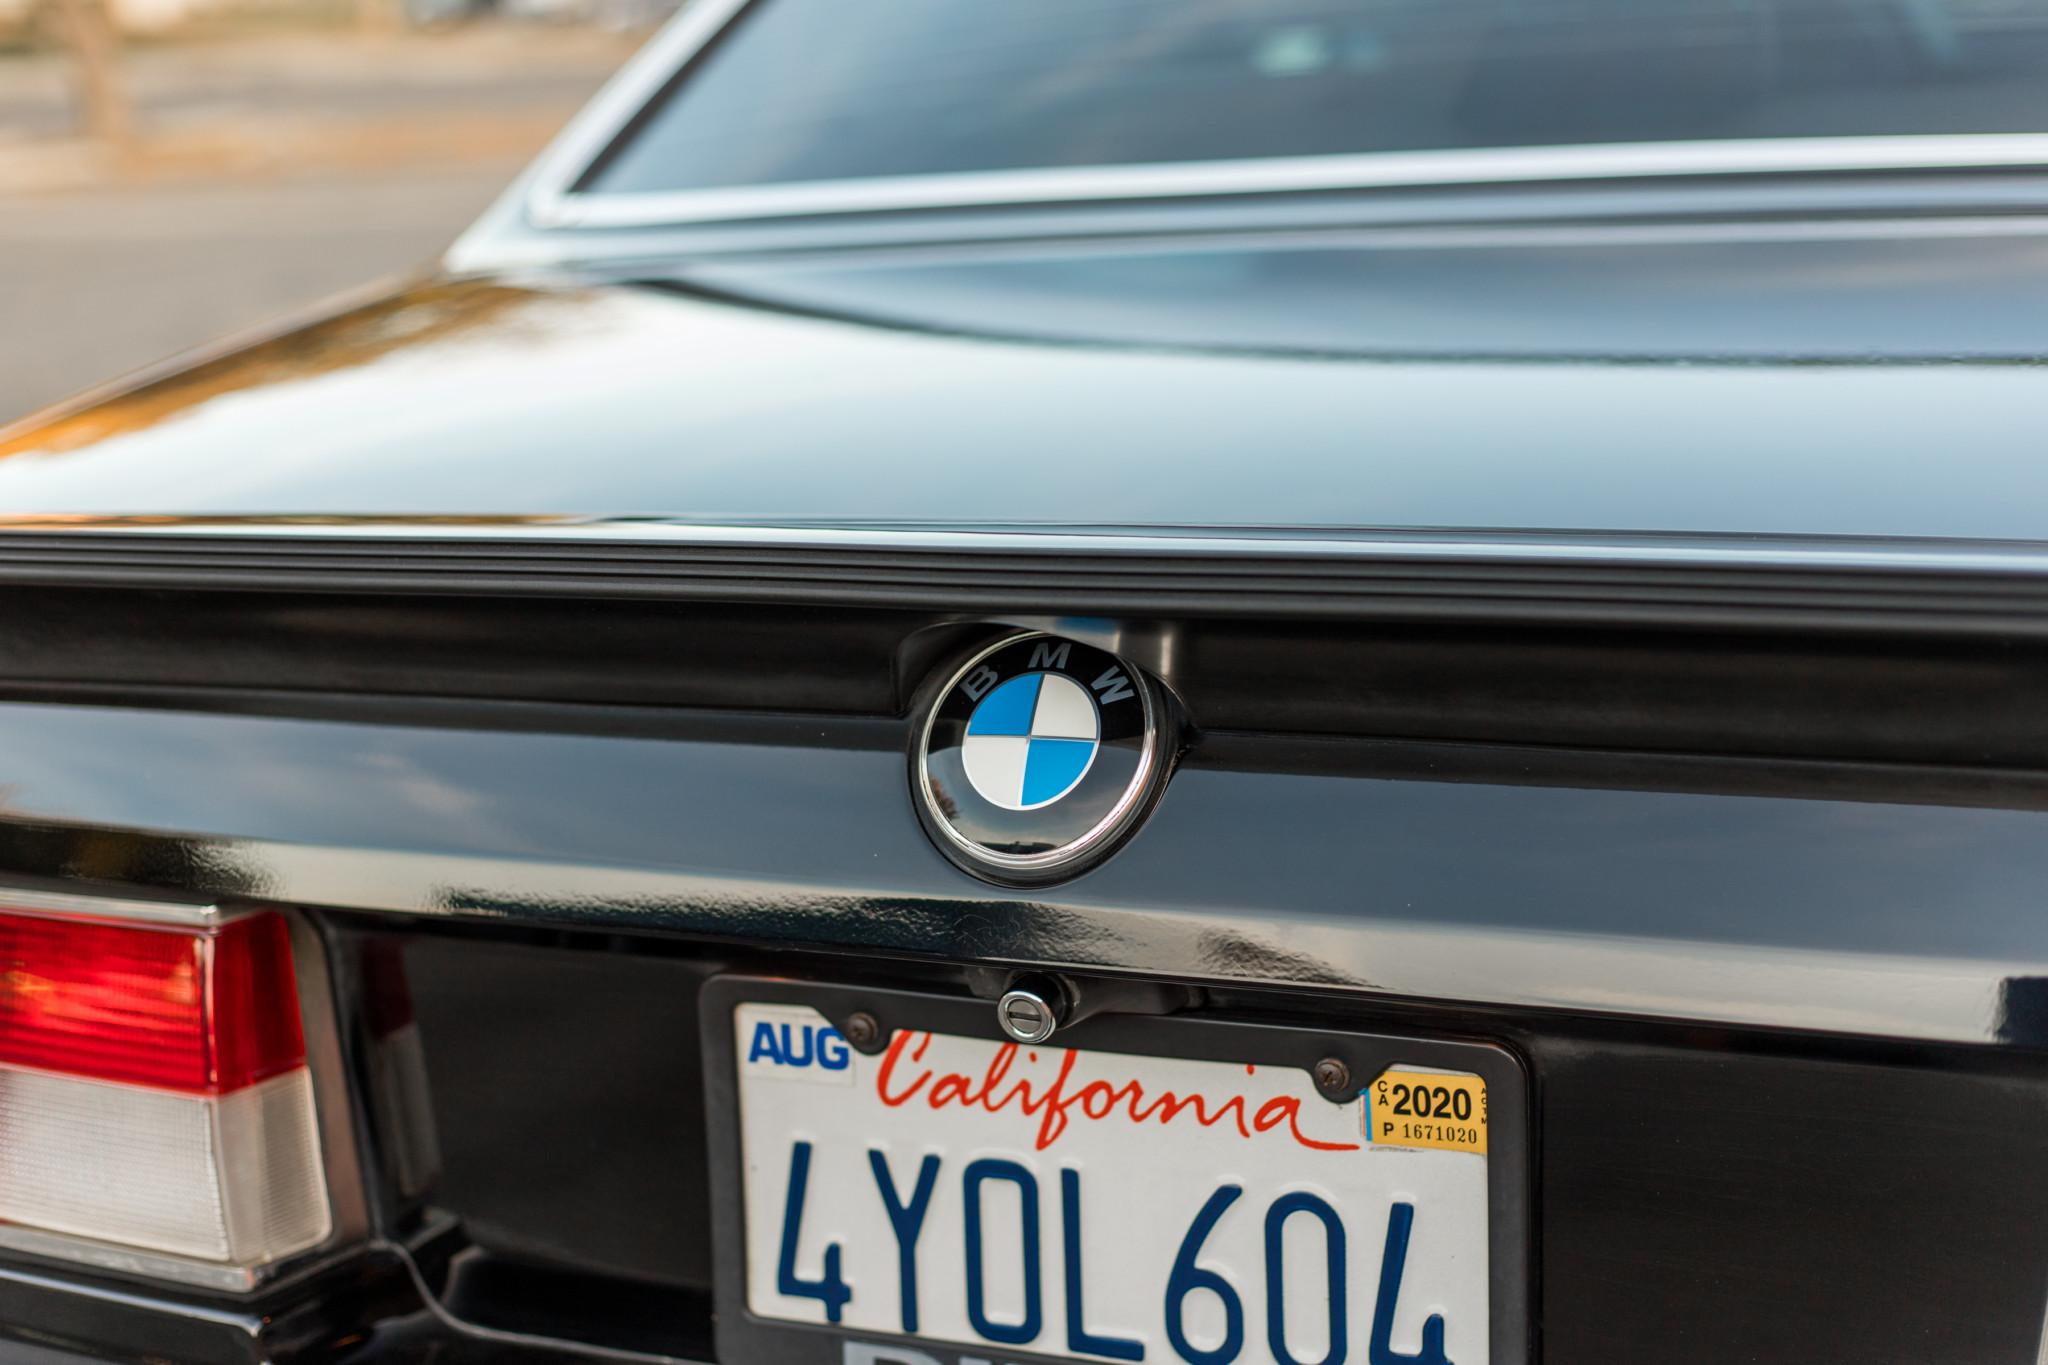 1988 bmw M6 kent classic cars (26).jpg